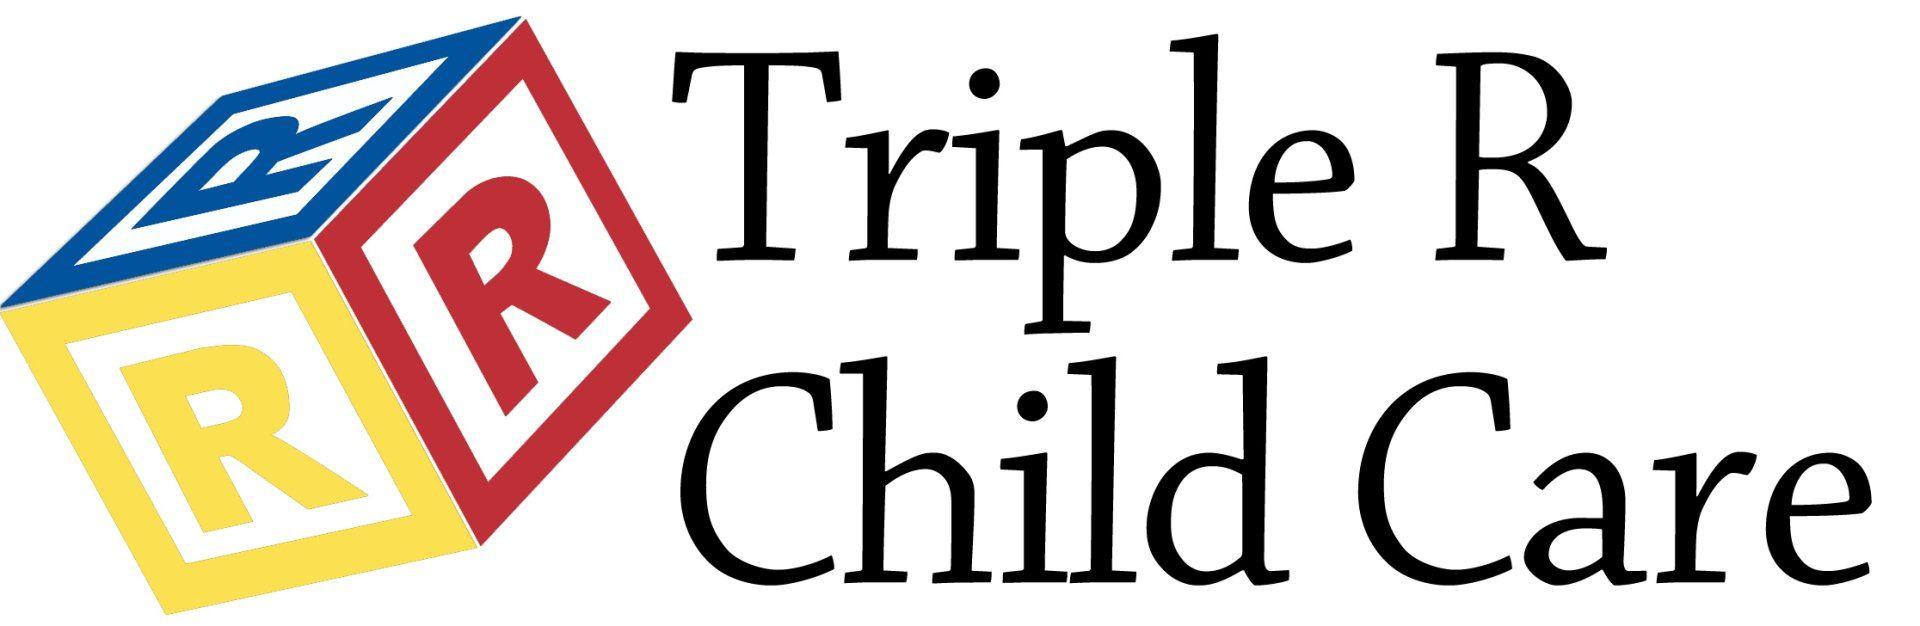 Triple R Childcare